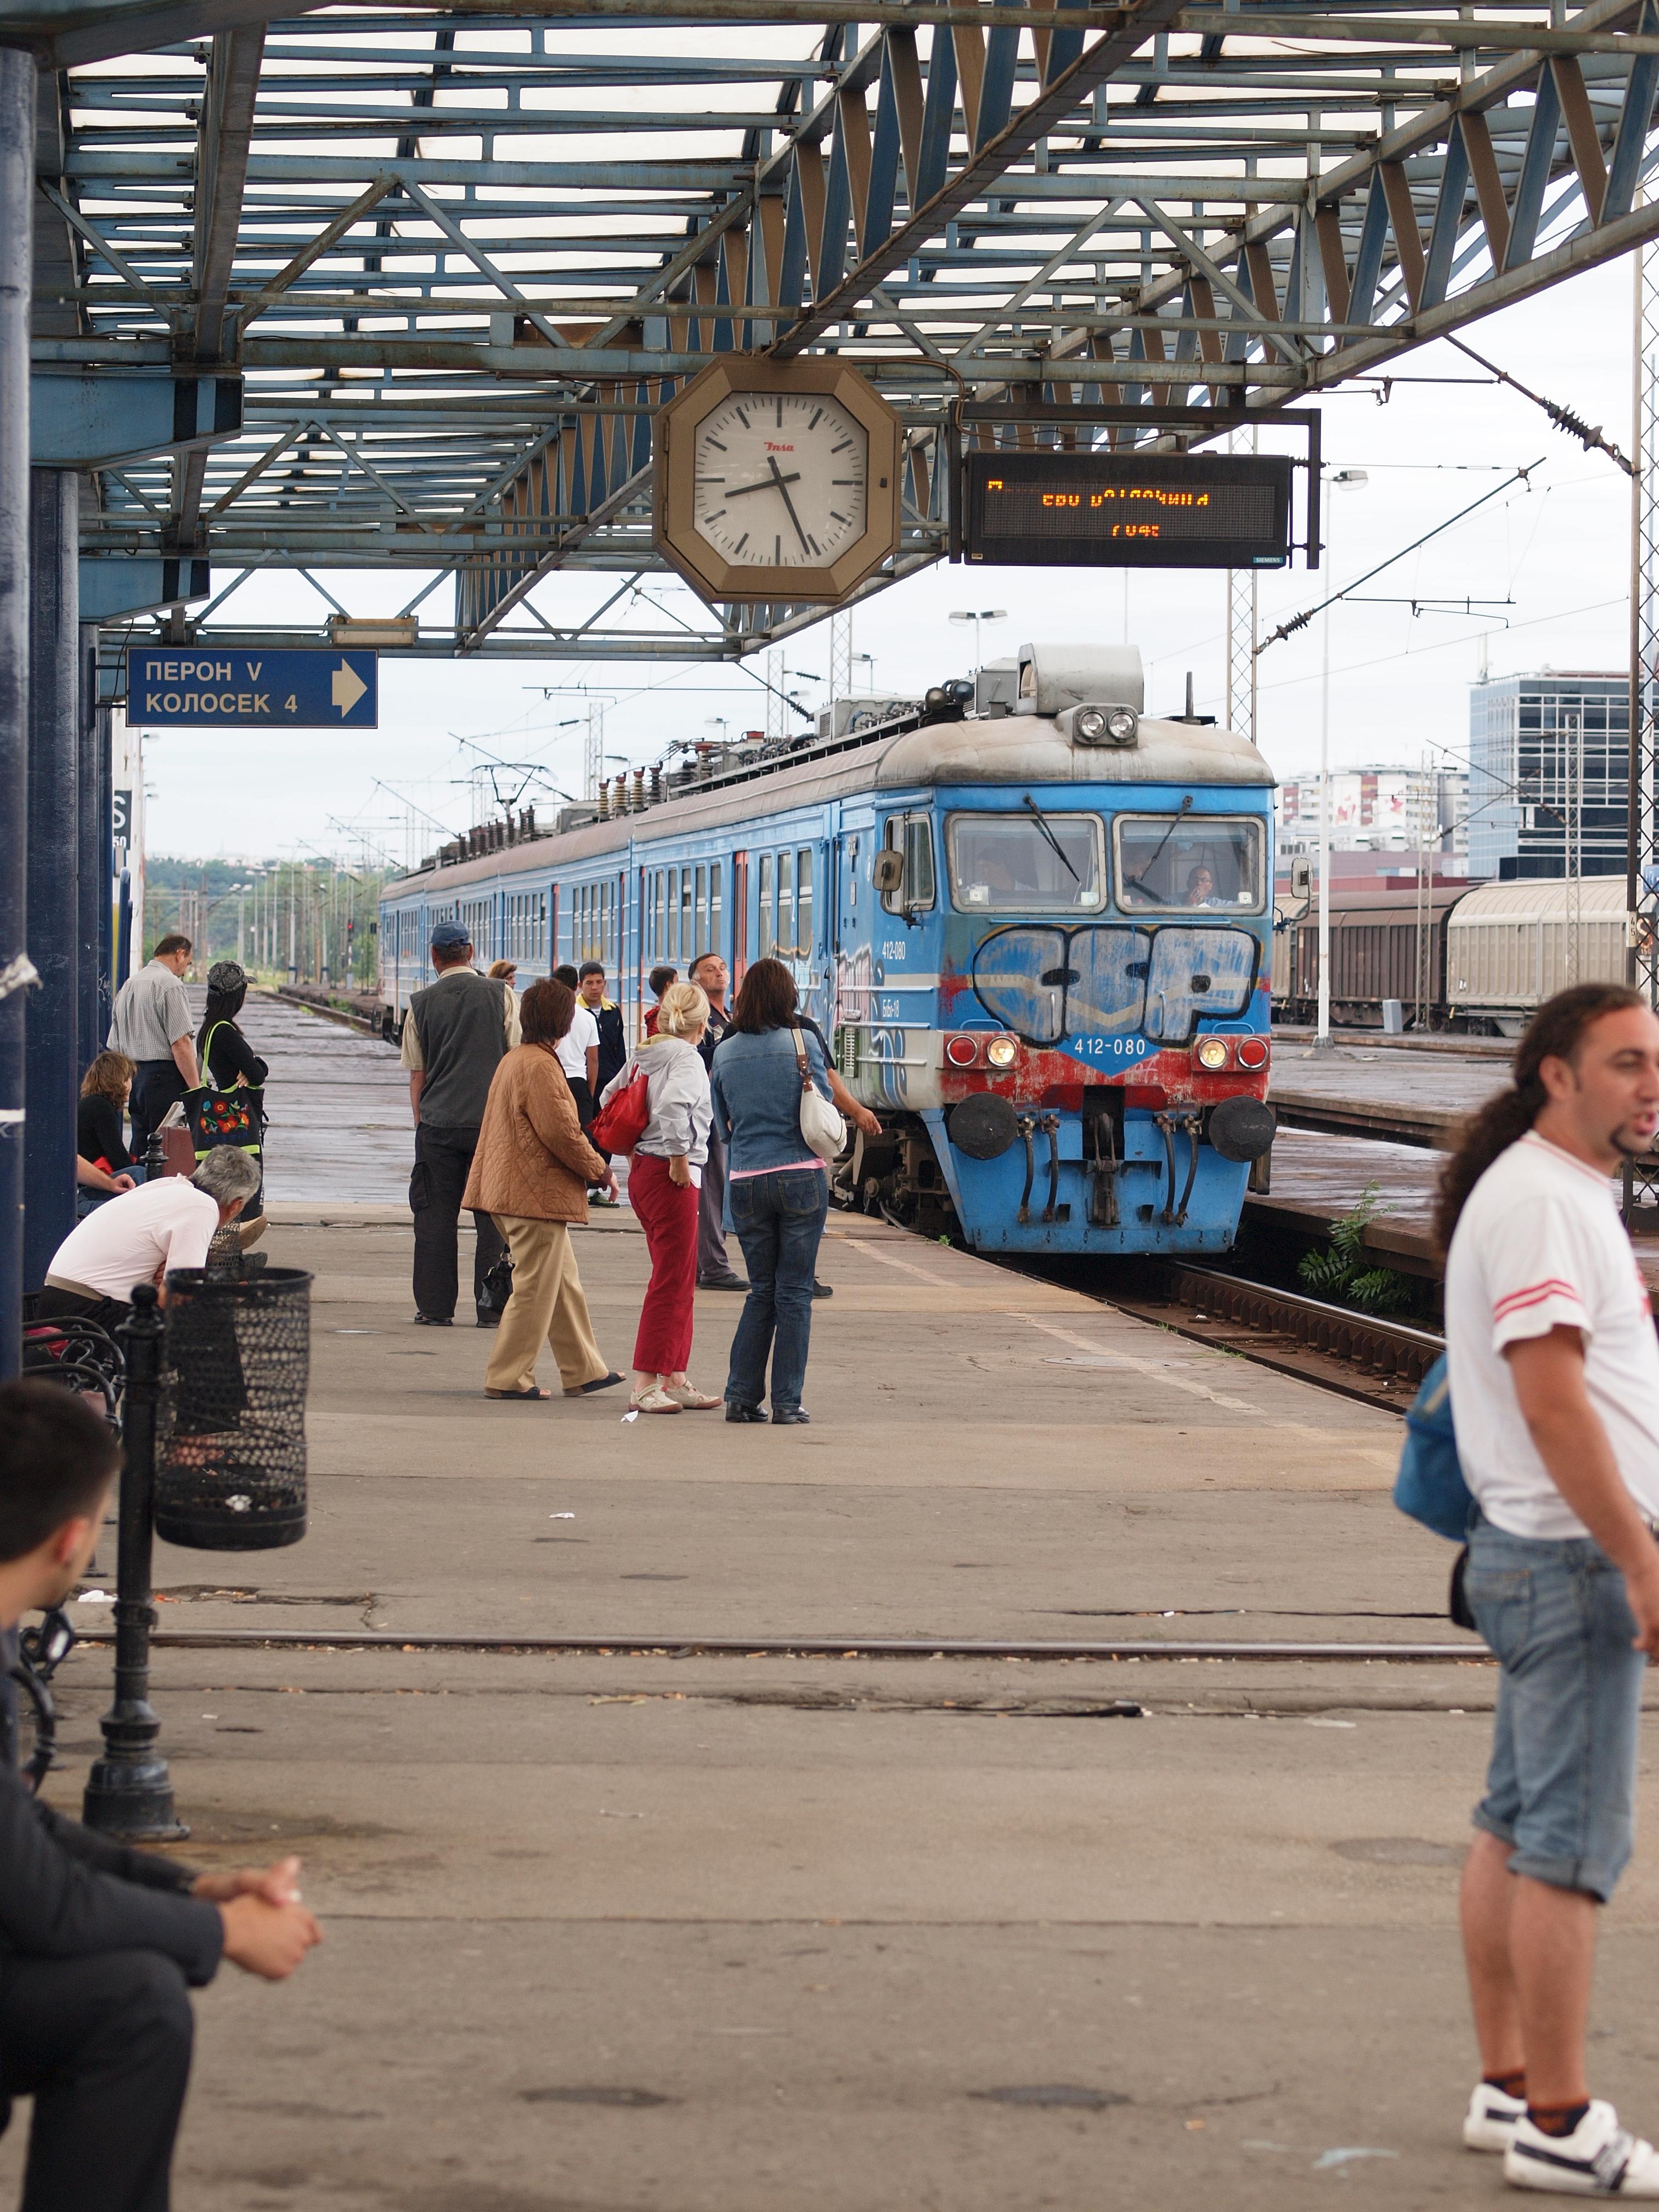 New Belgrade Railway Station Wikipedia